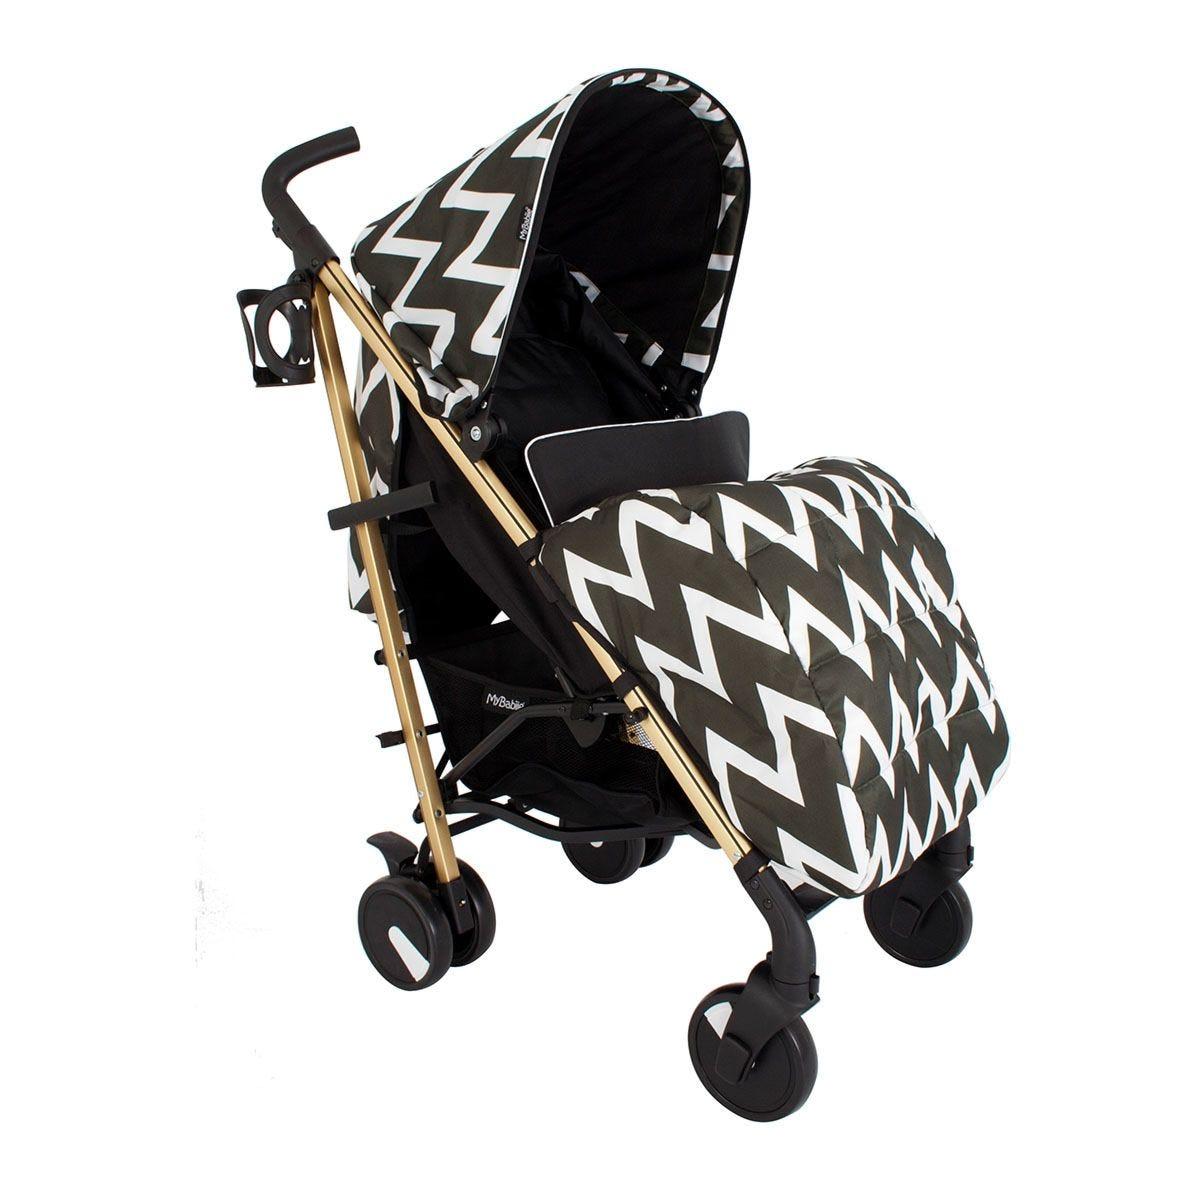 My Babiie MB51 Gold Edition Chevron Stroller - Black